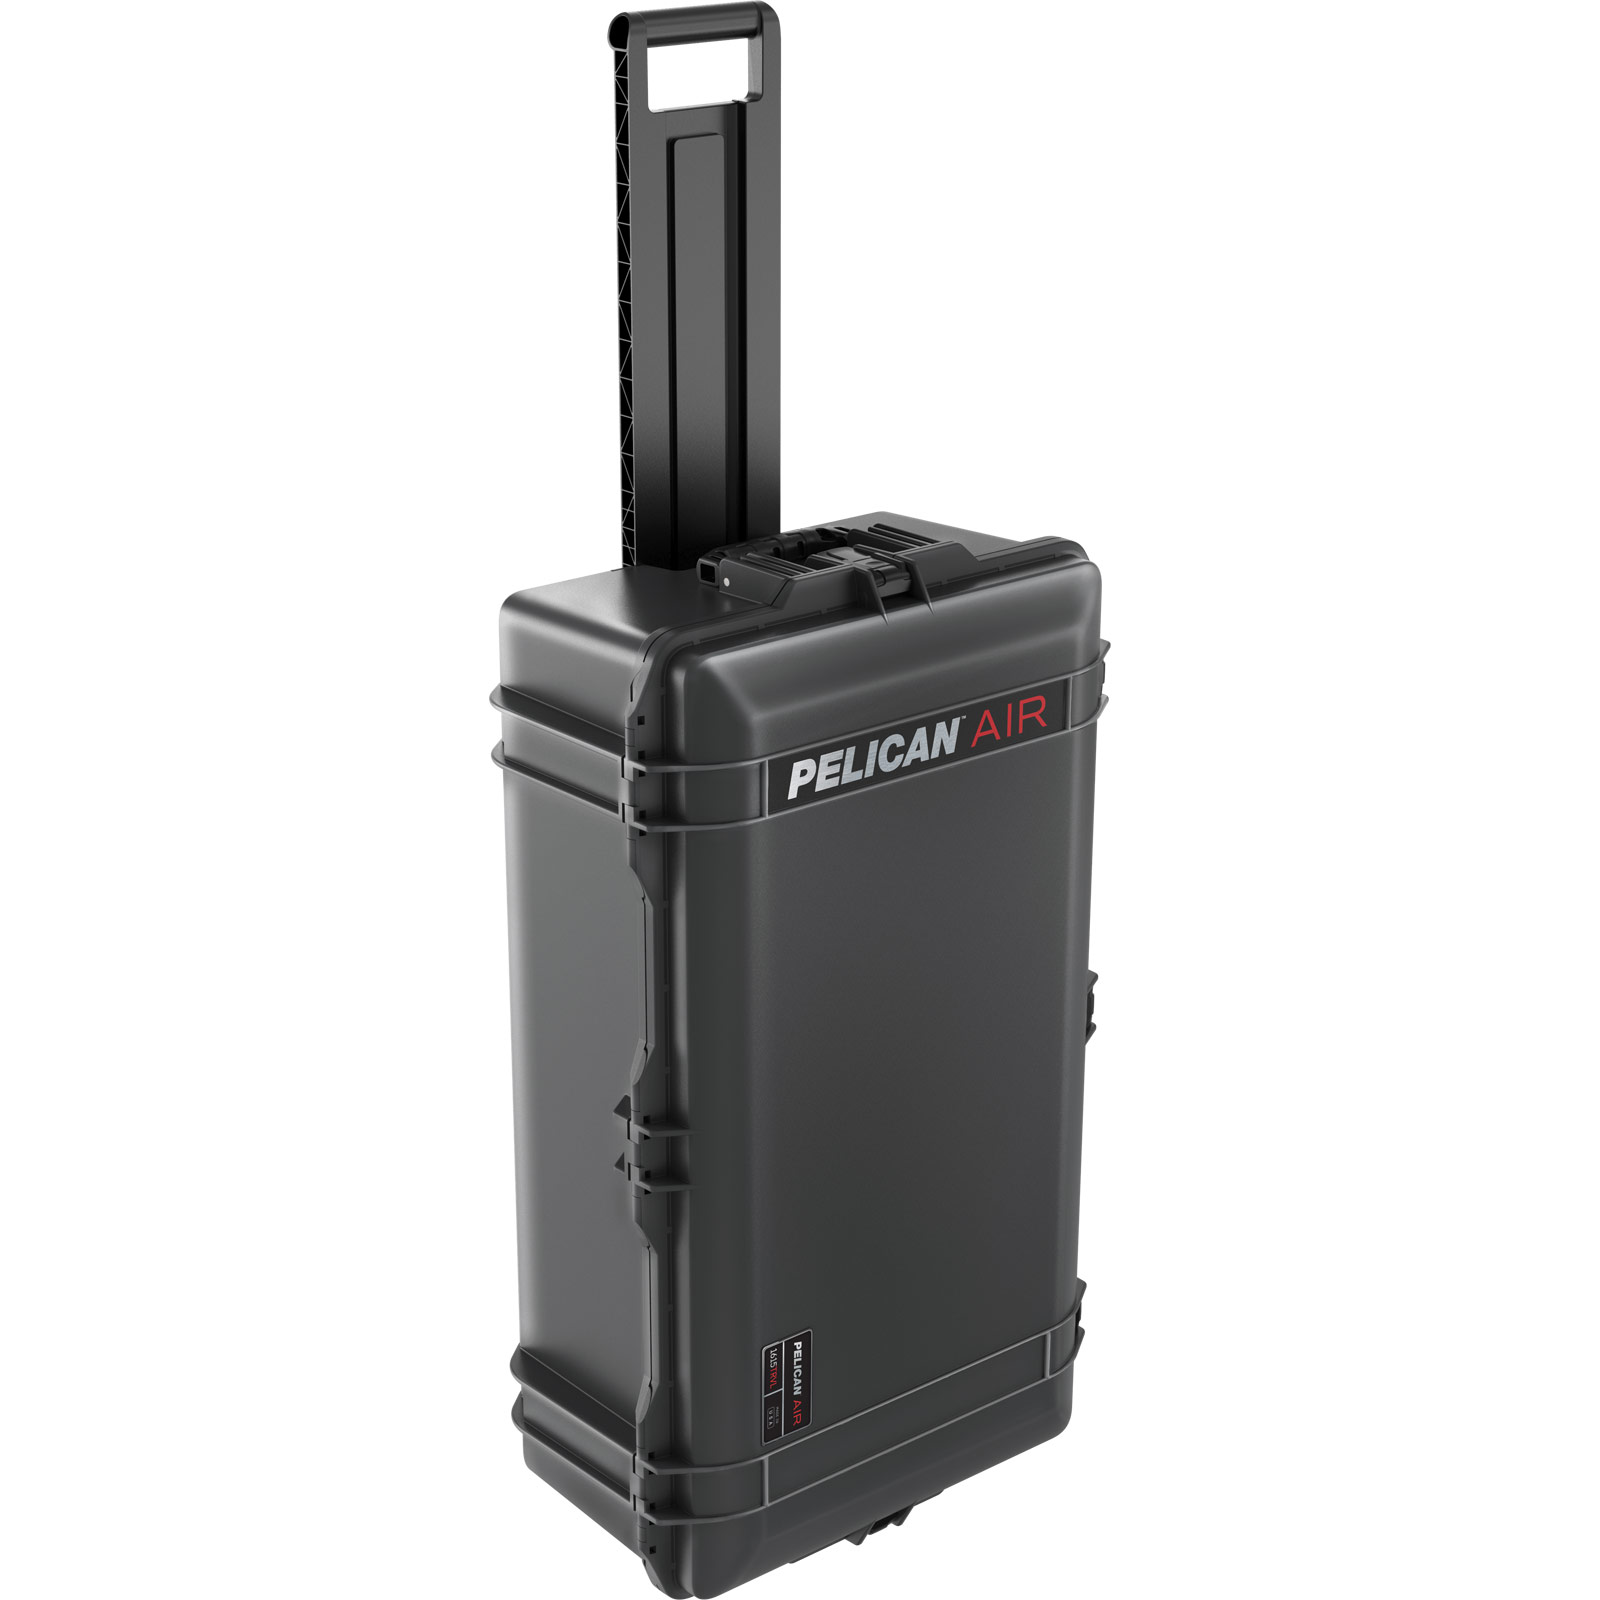 pelican travel air 1615 light case